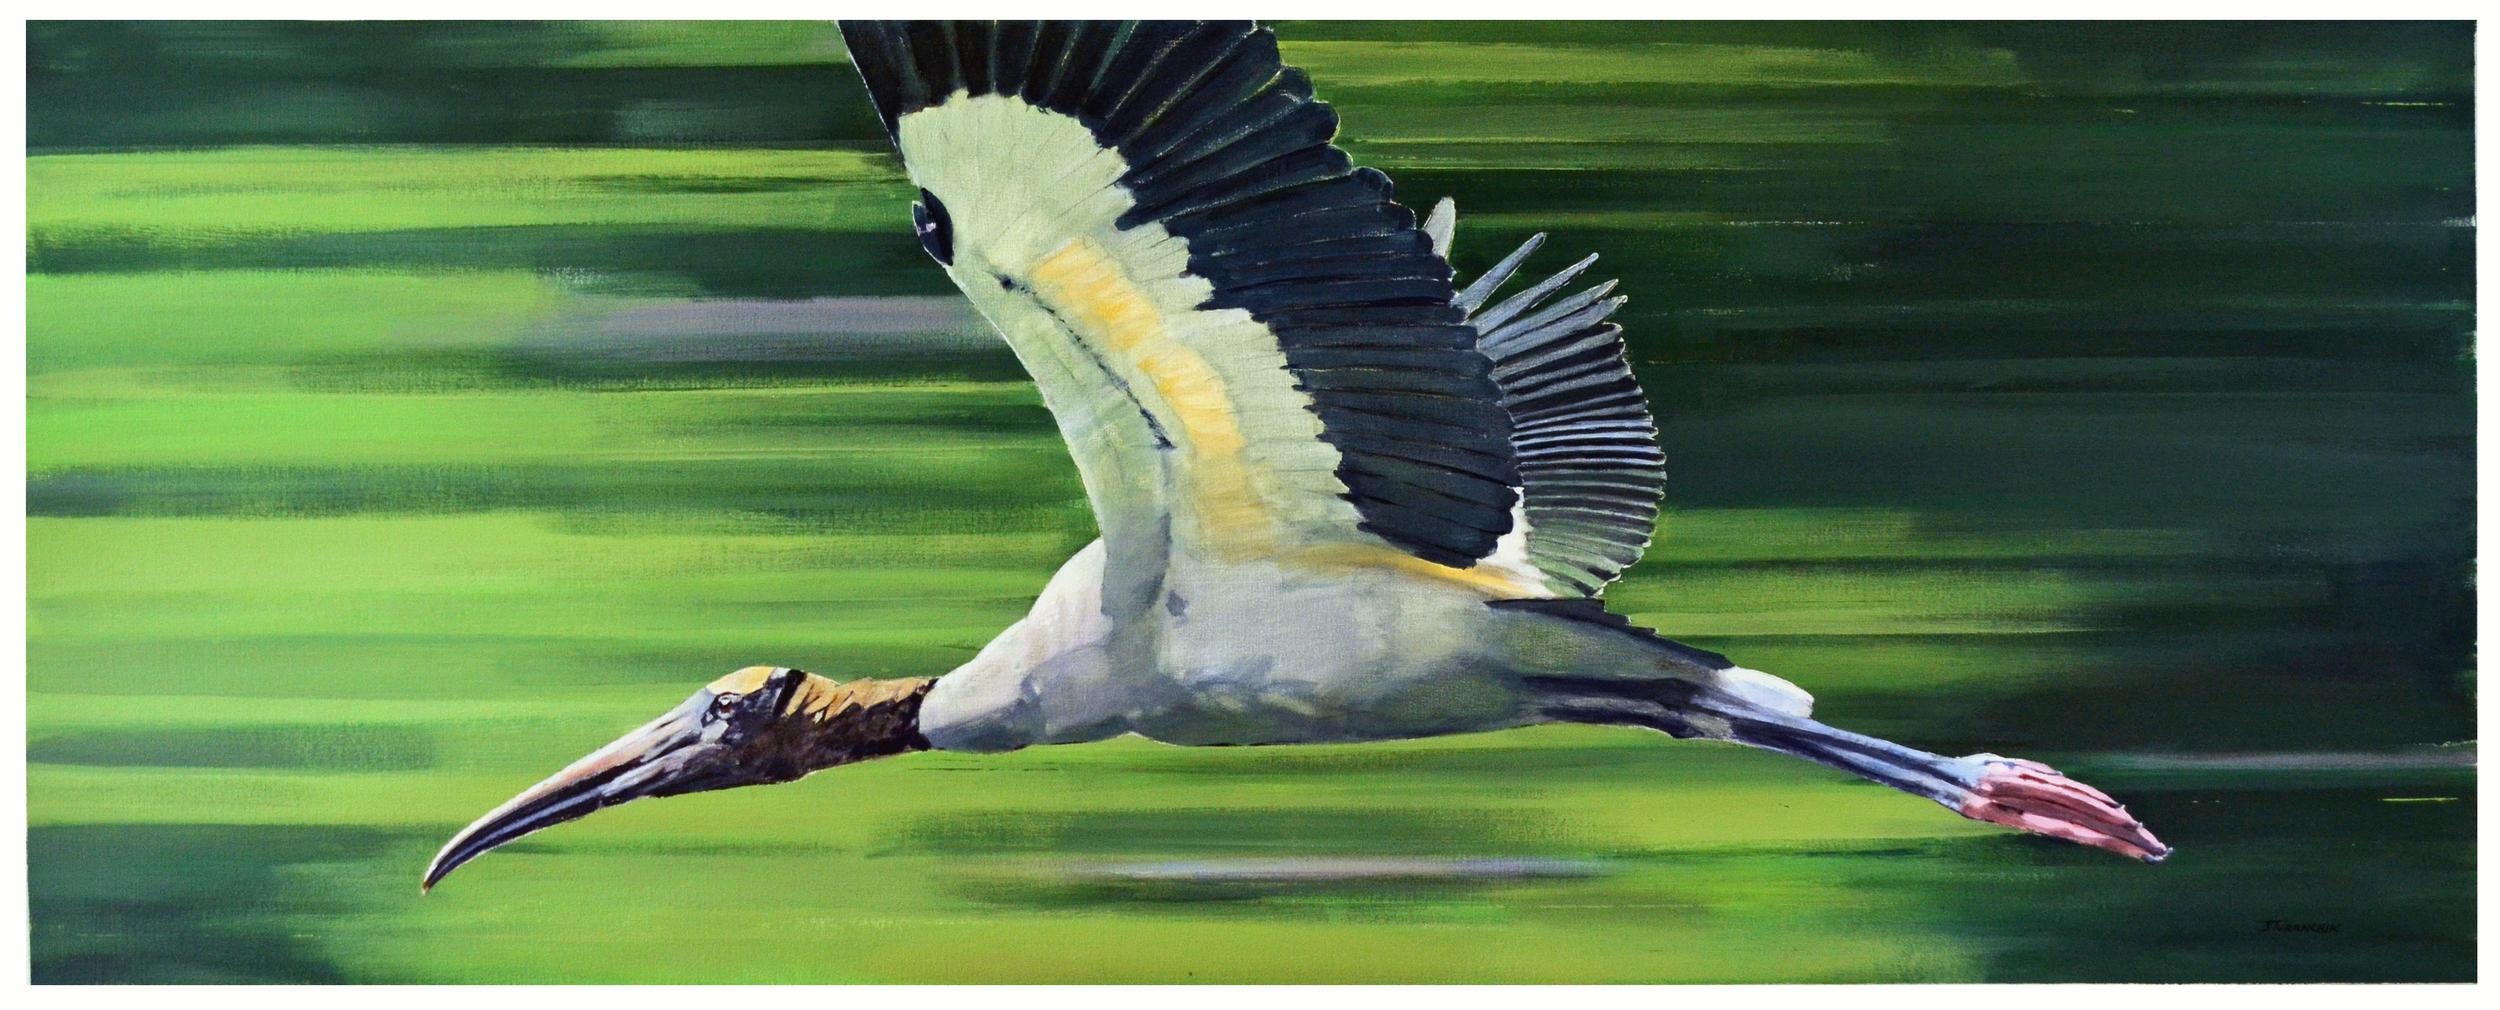 Bird in Flight - Wood Stork